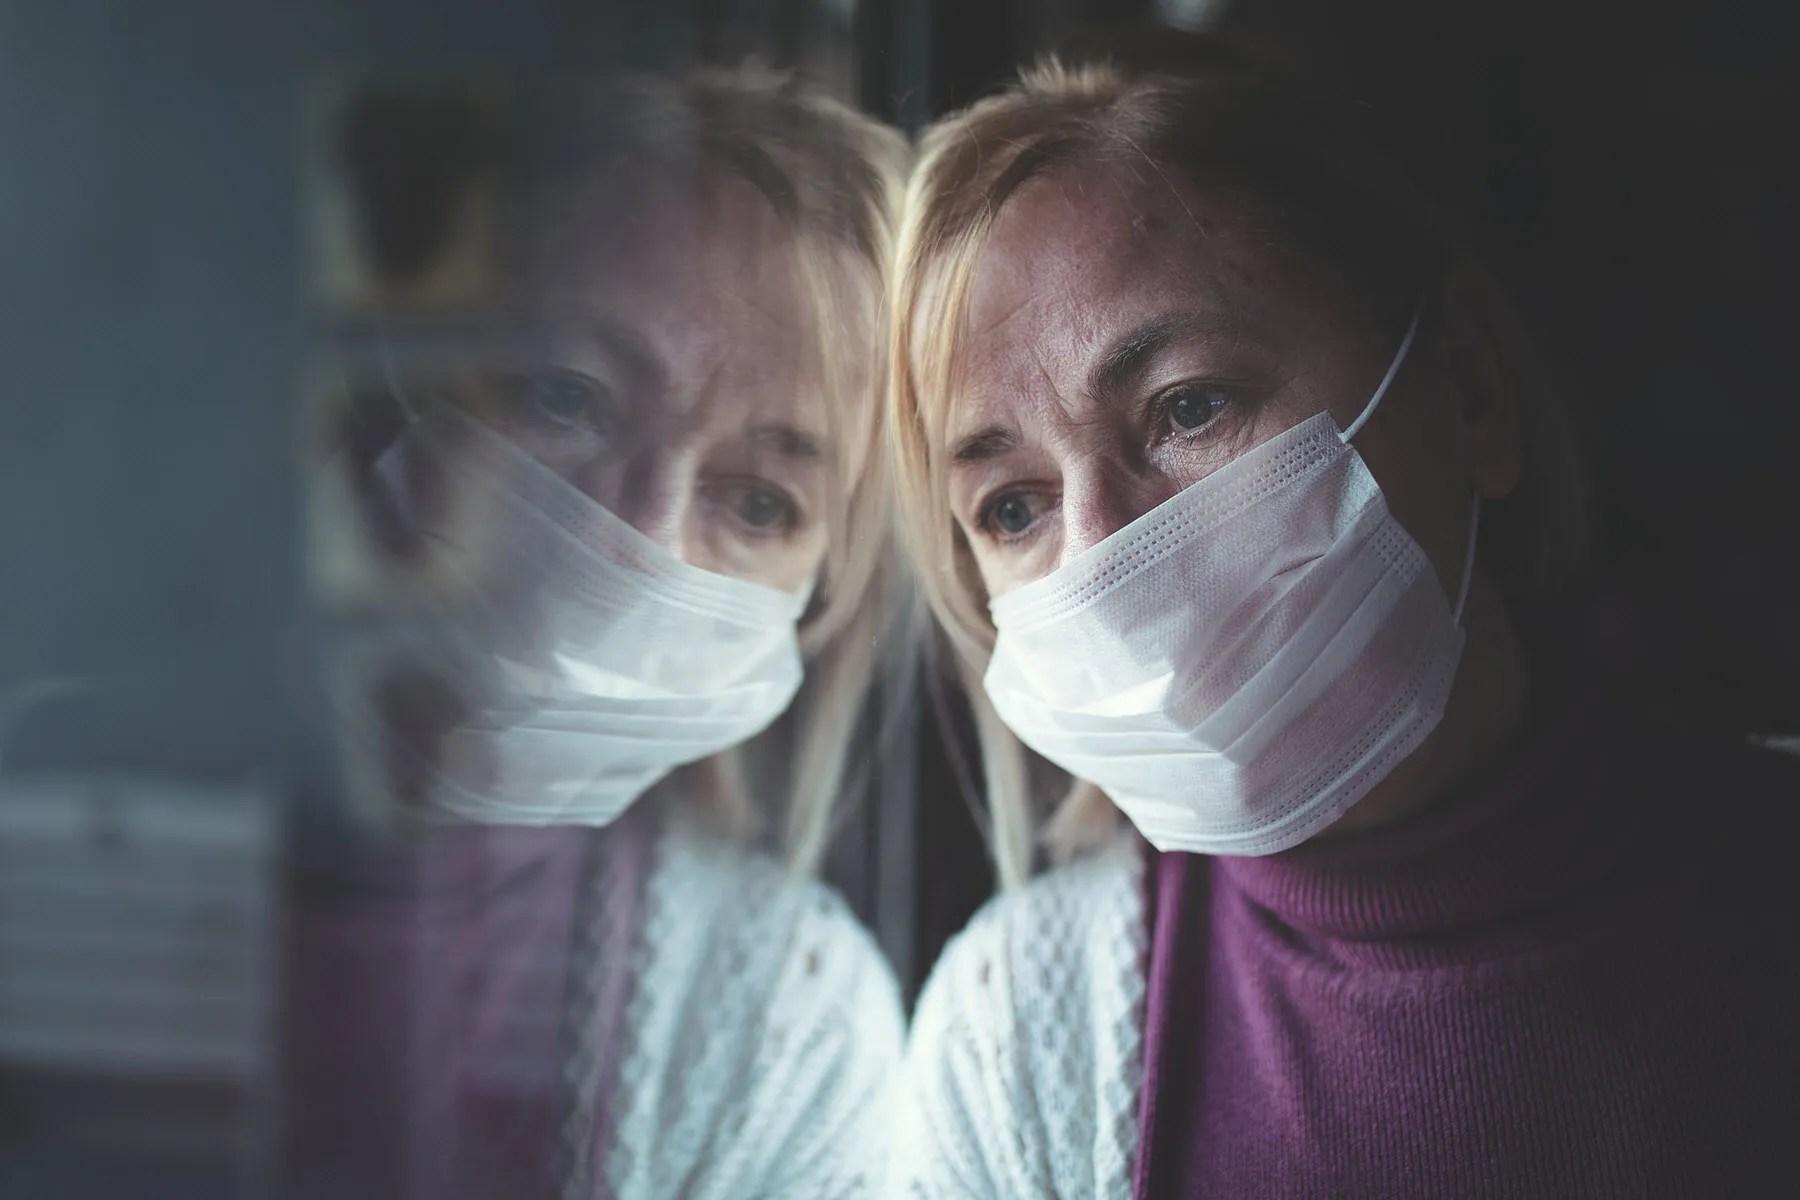 Louisiana Reinstates Indoor Mask Mandate as Hospitals Fill